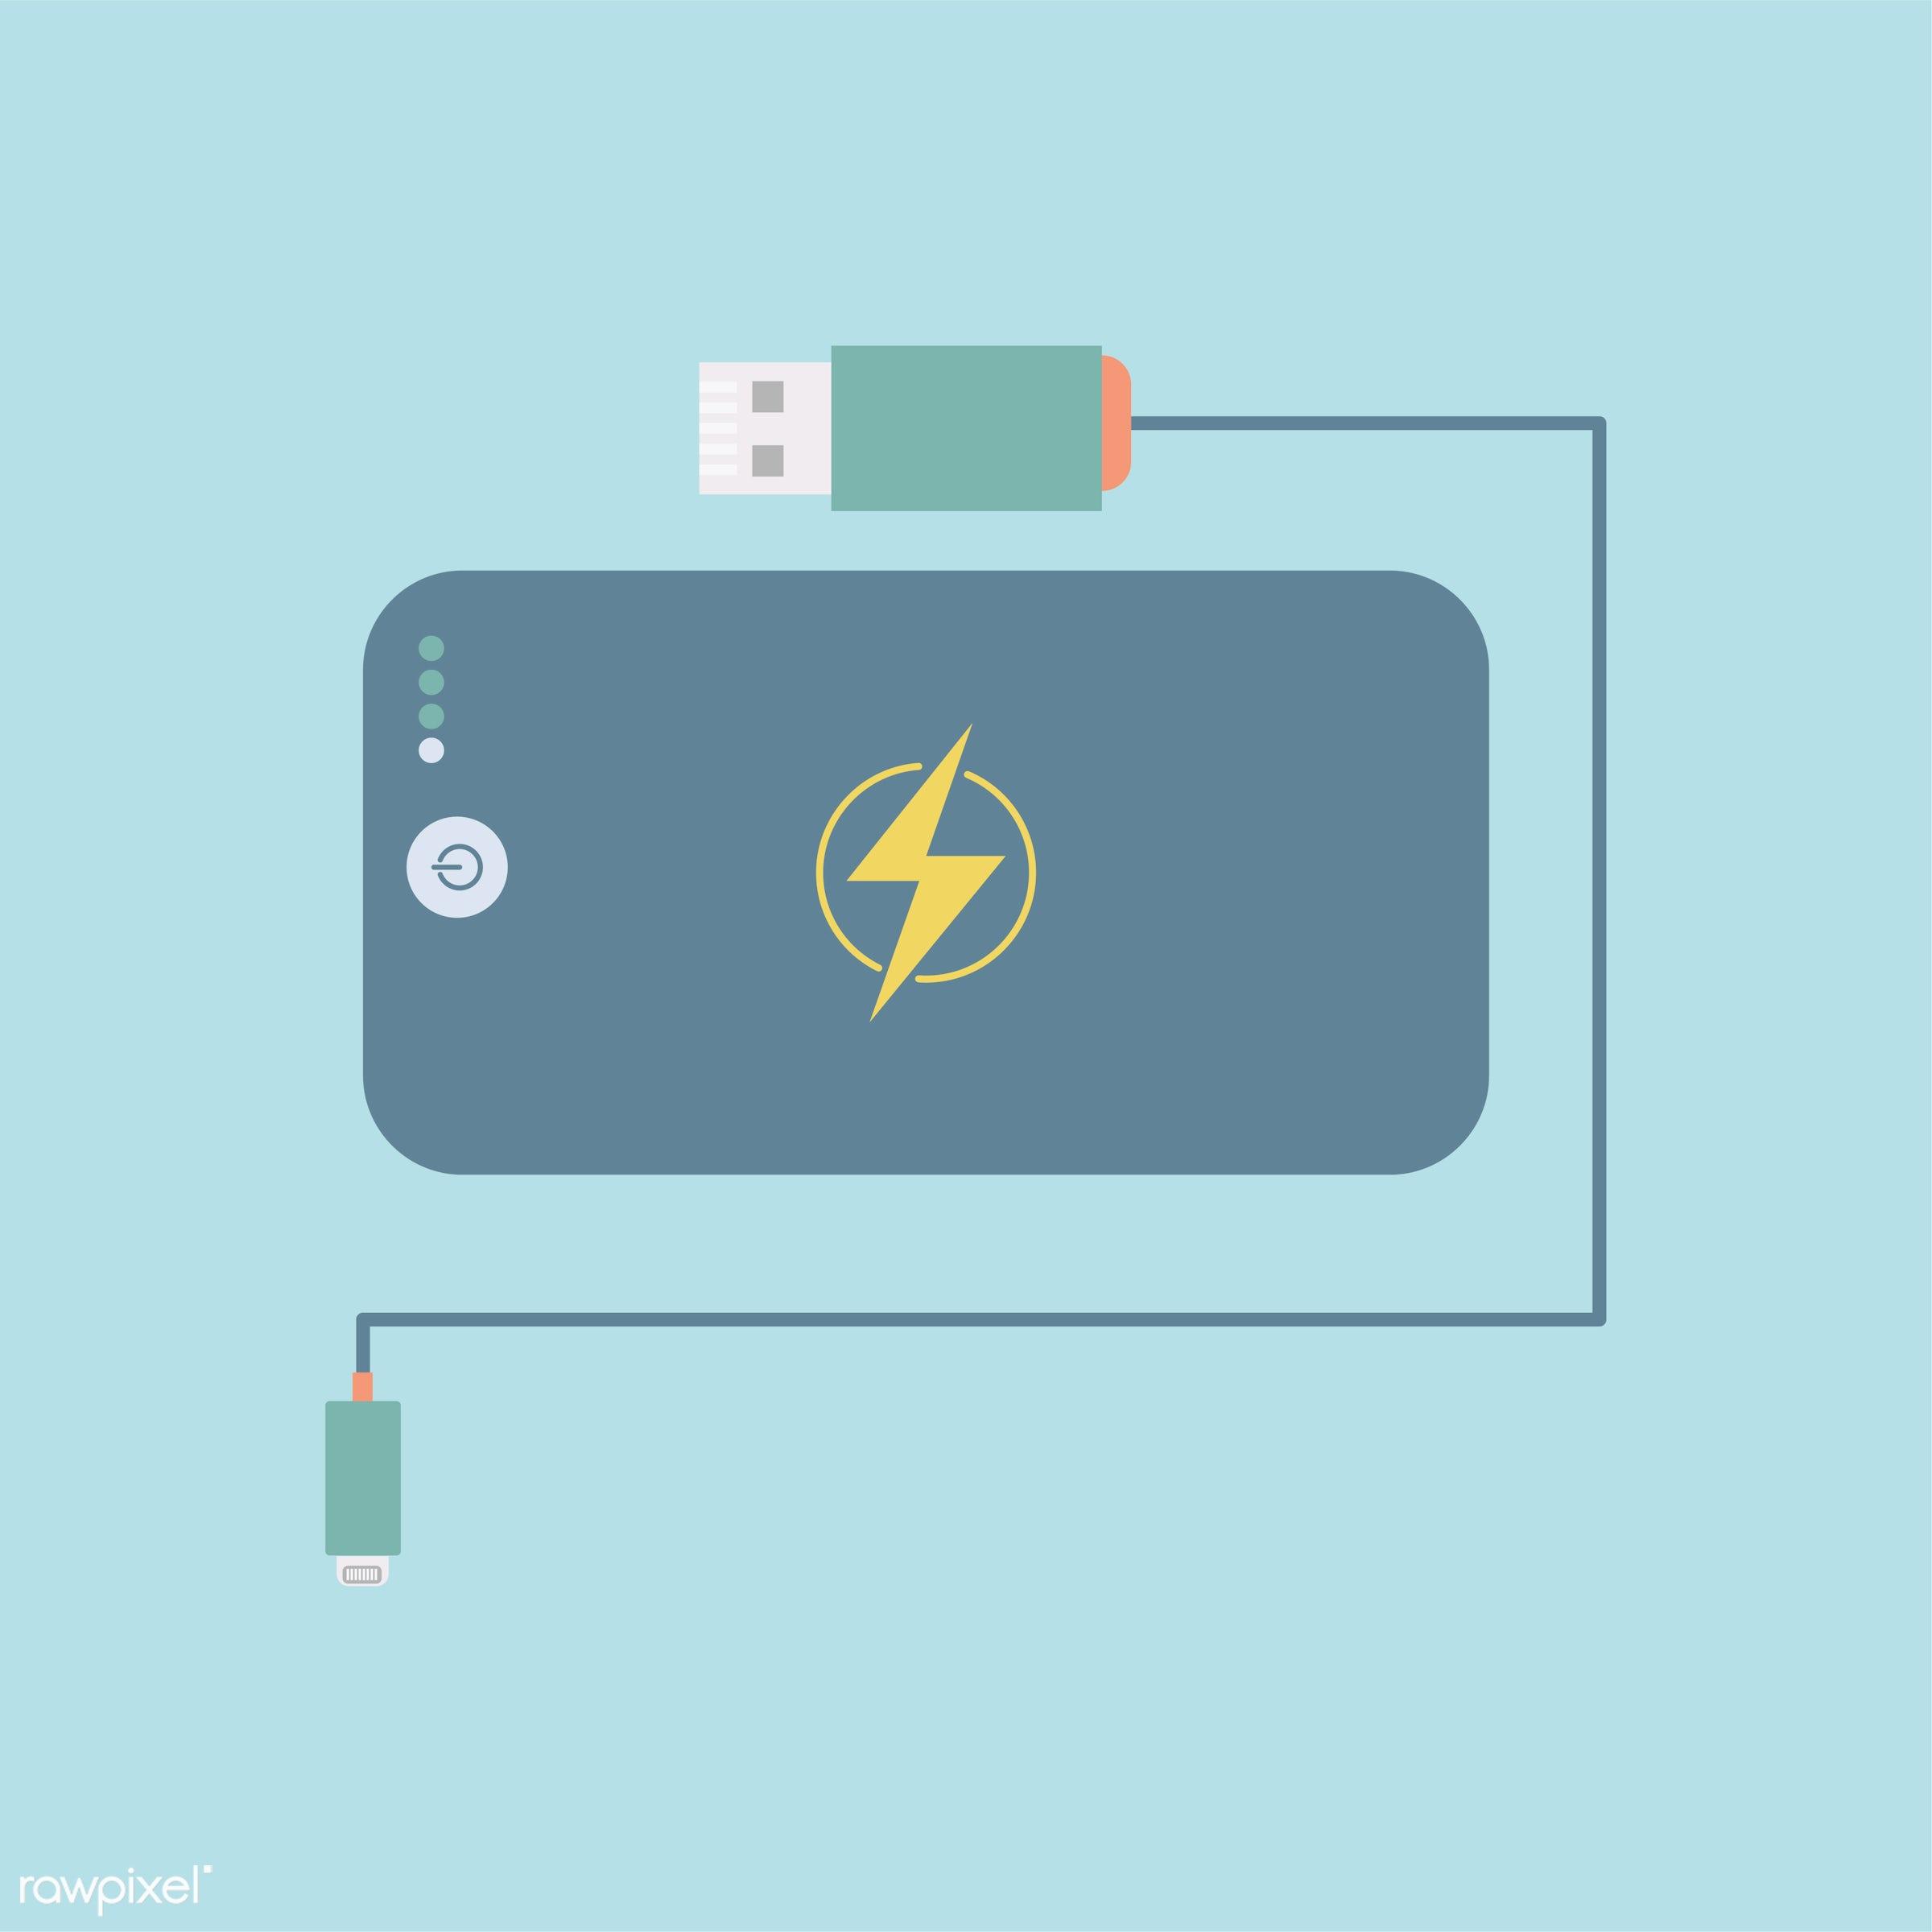 vector, illustration, graphic, blue, tech, technology, digital, device, internet, phone, smartphone, mobile, app, connection...